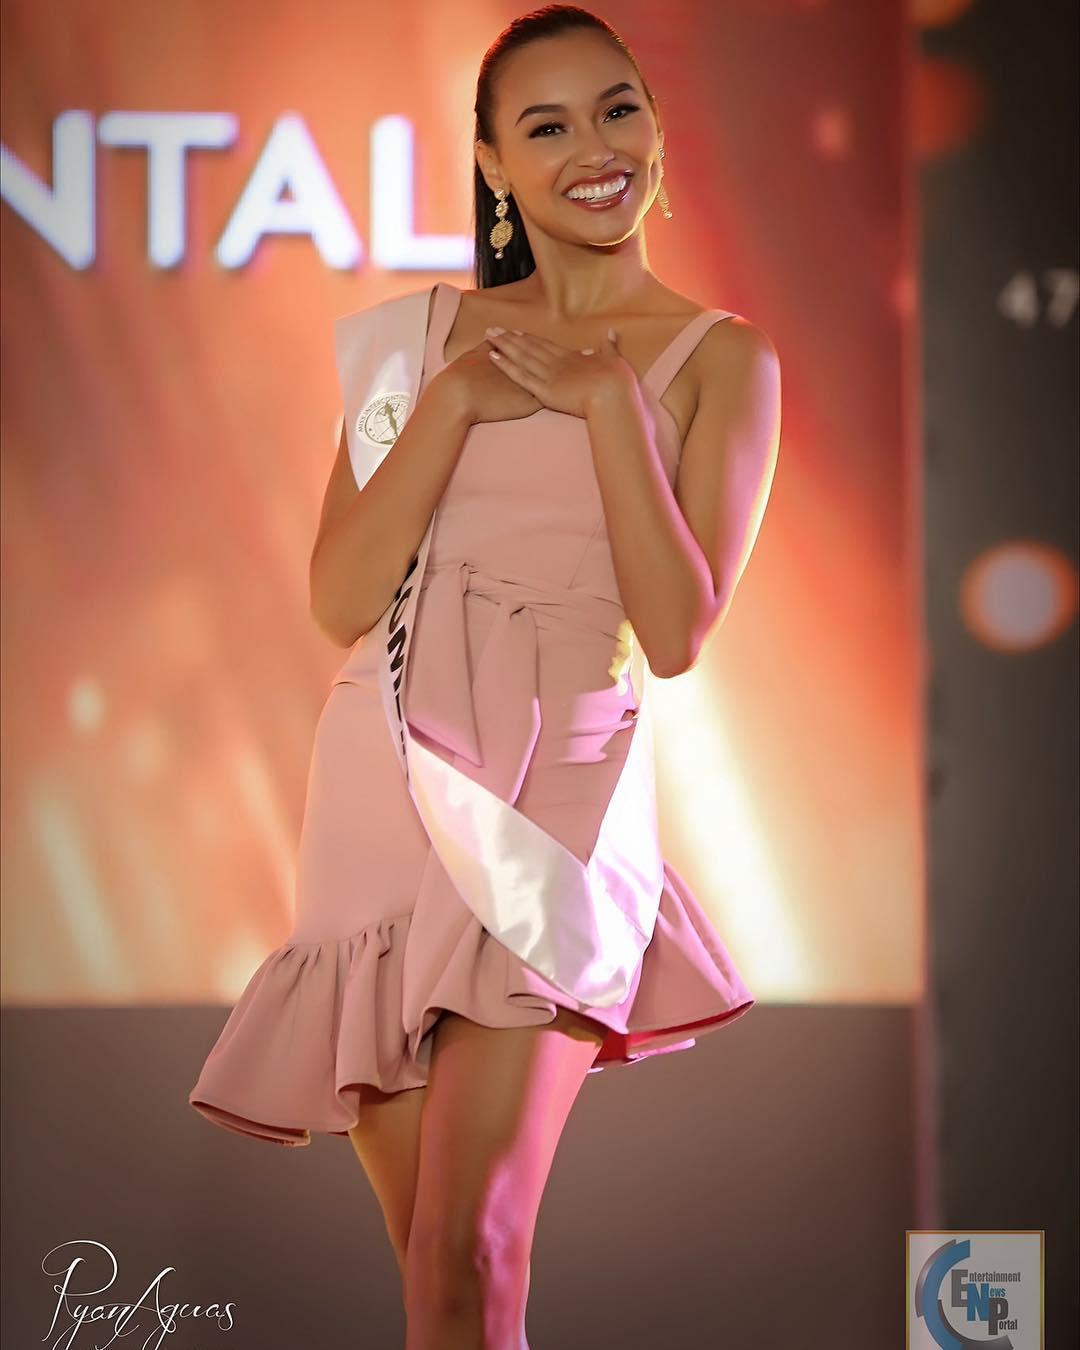 hillary hollman, 3rd runner-up de miss intercontinental 2018-2019. - Página 3 49601710